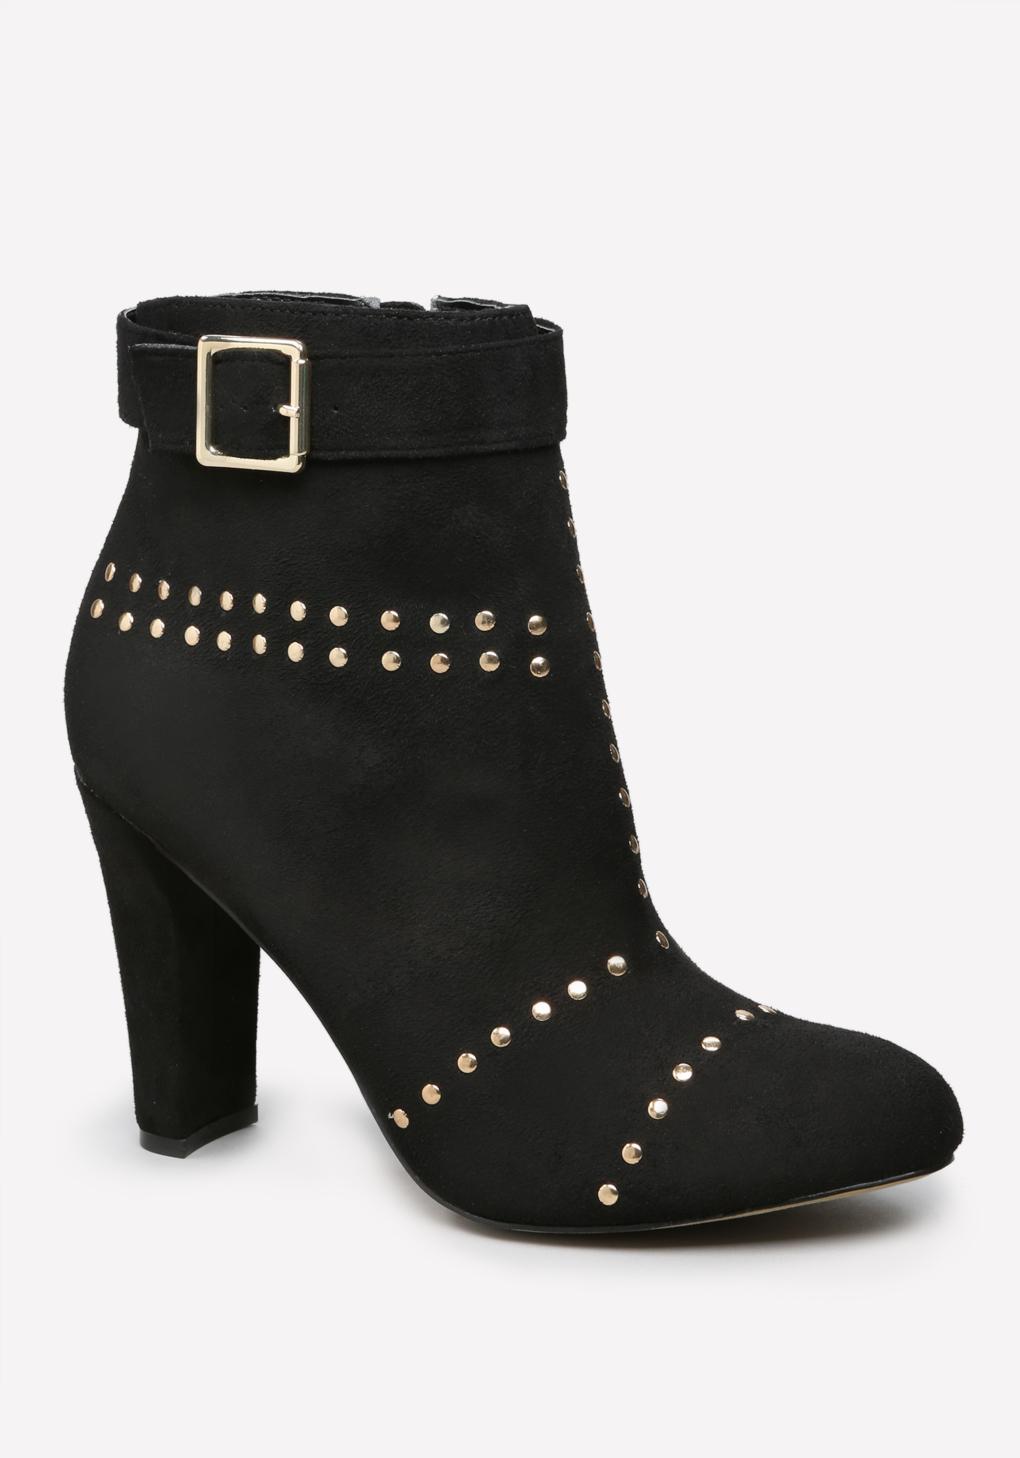 Boot Bebe Shoes